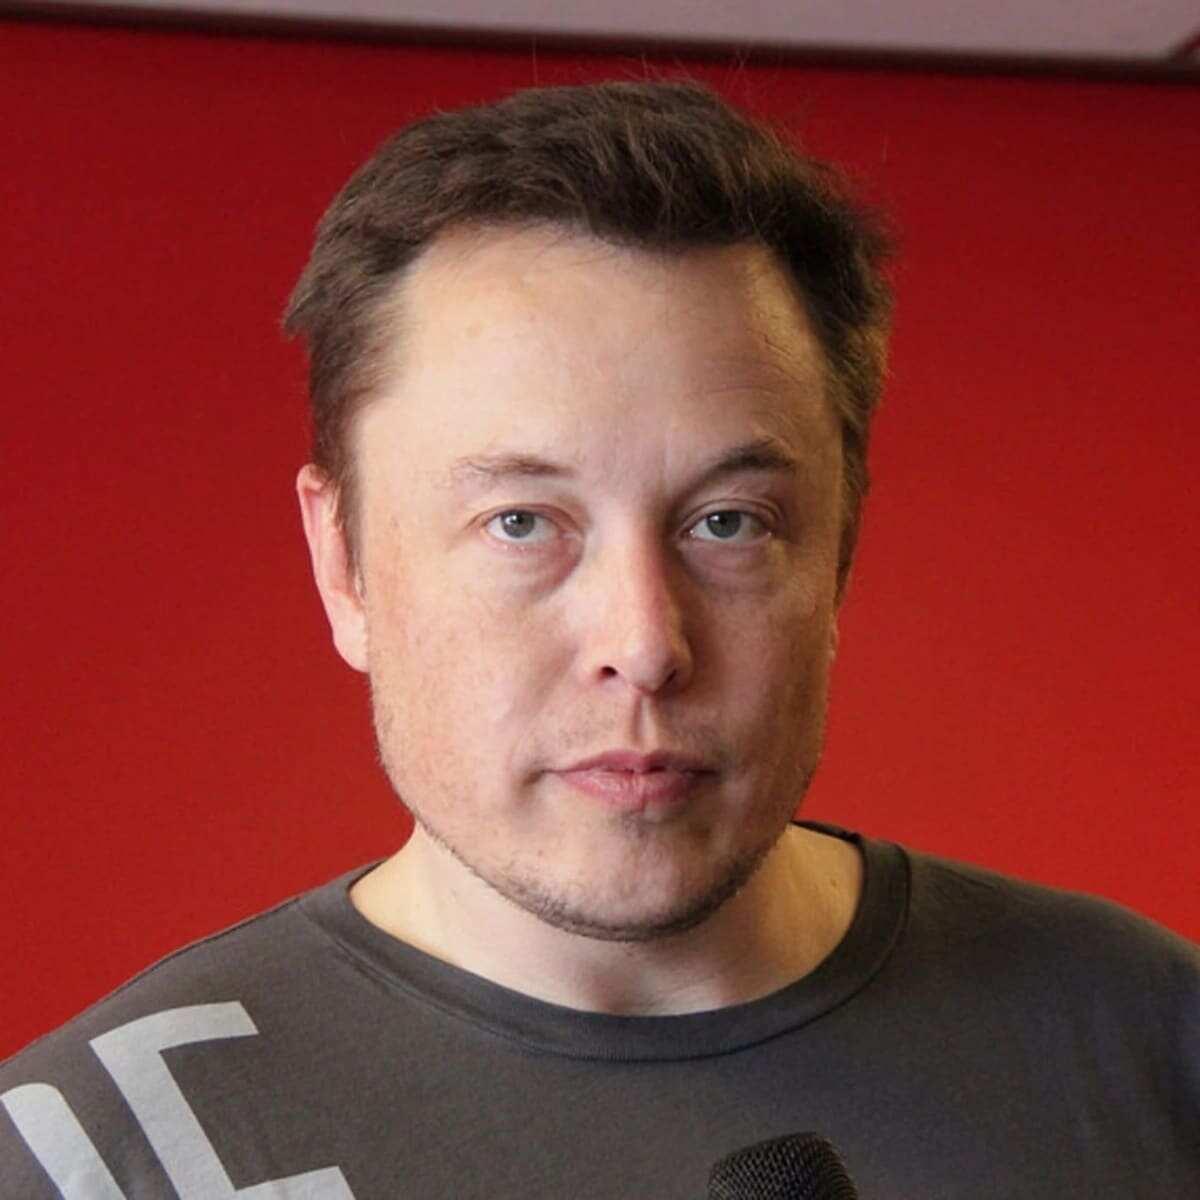 Elon Musk. Photo credit: Sourced